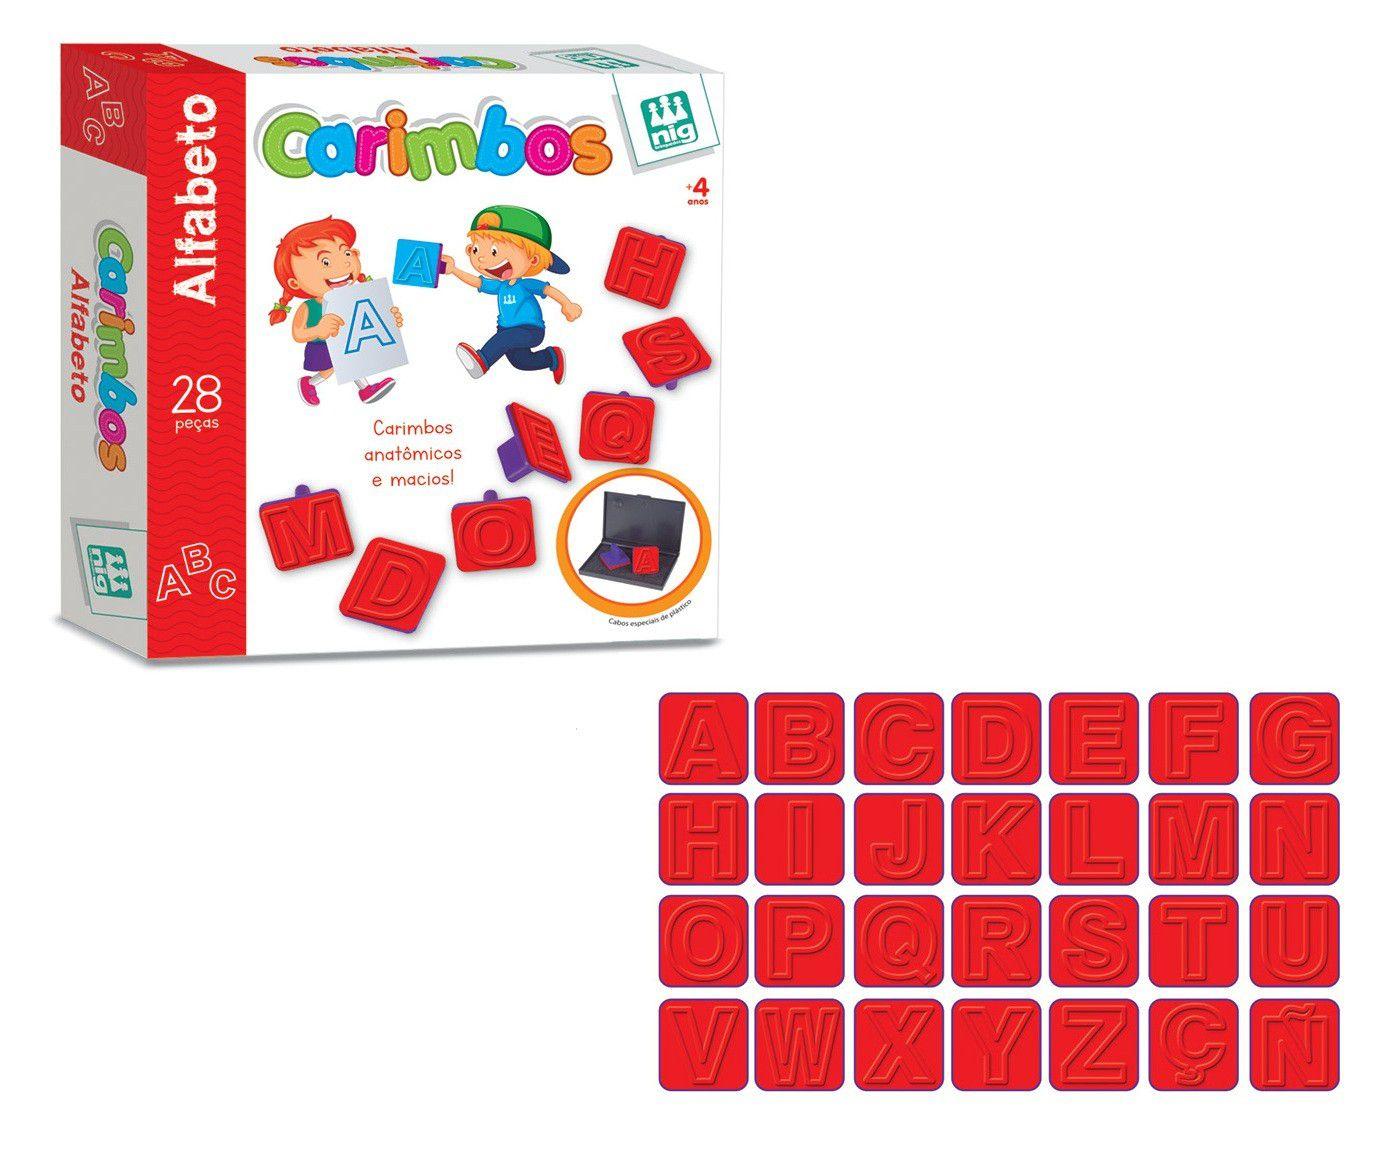 Carimbos Alfabeto 28 Peças - Nig Brinquedos